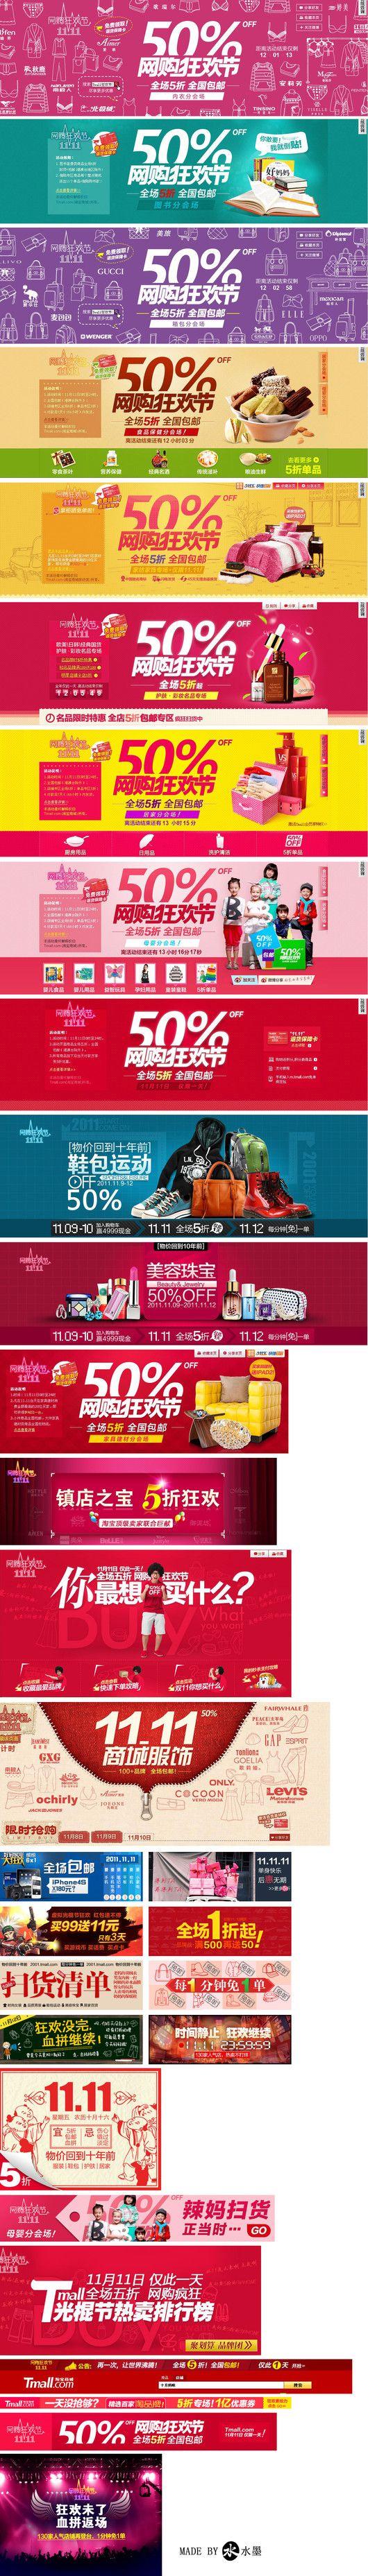 Chinese Web banner 淘宝店铺广告及Banner设计